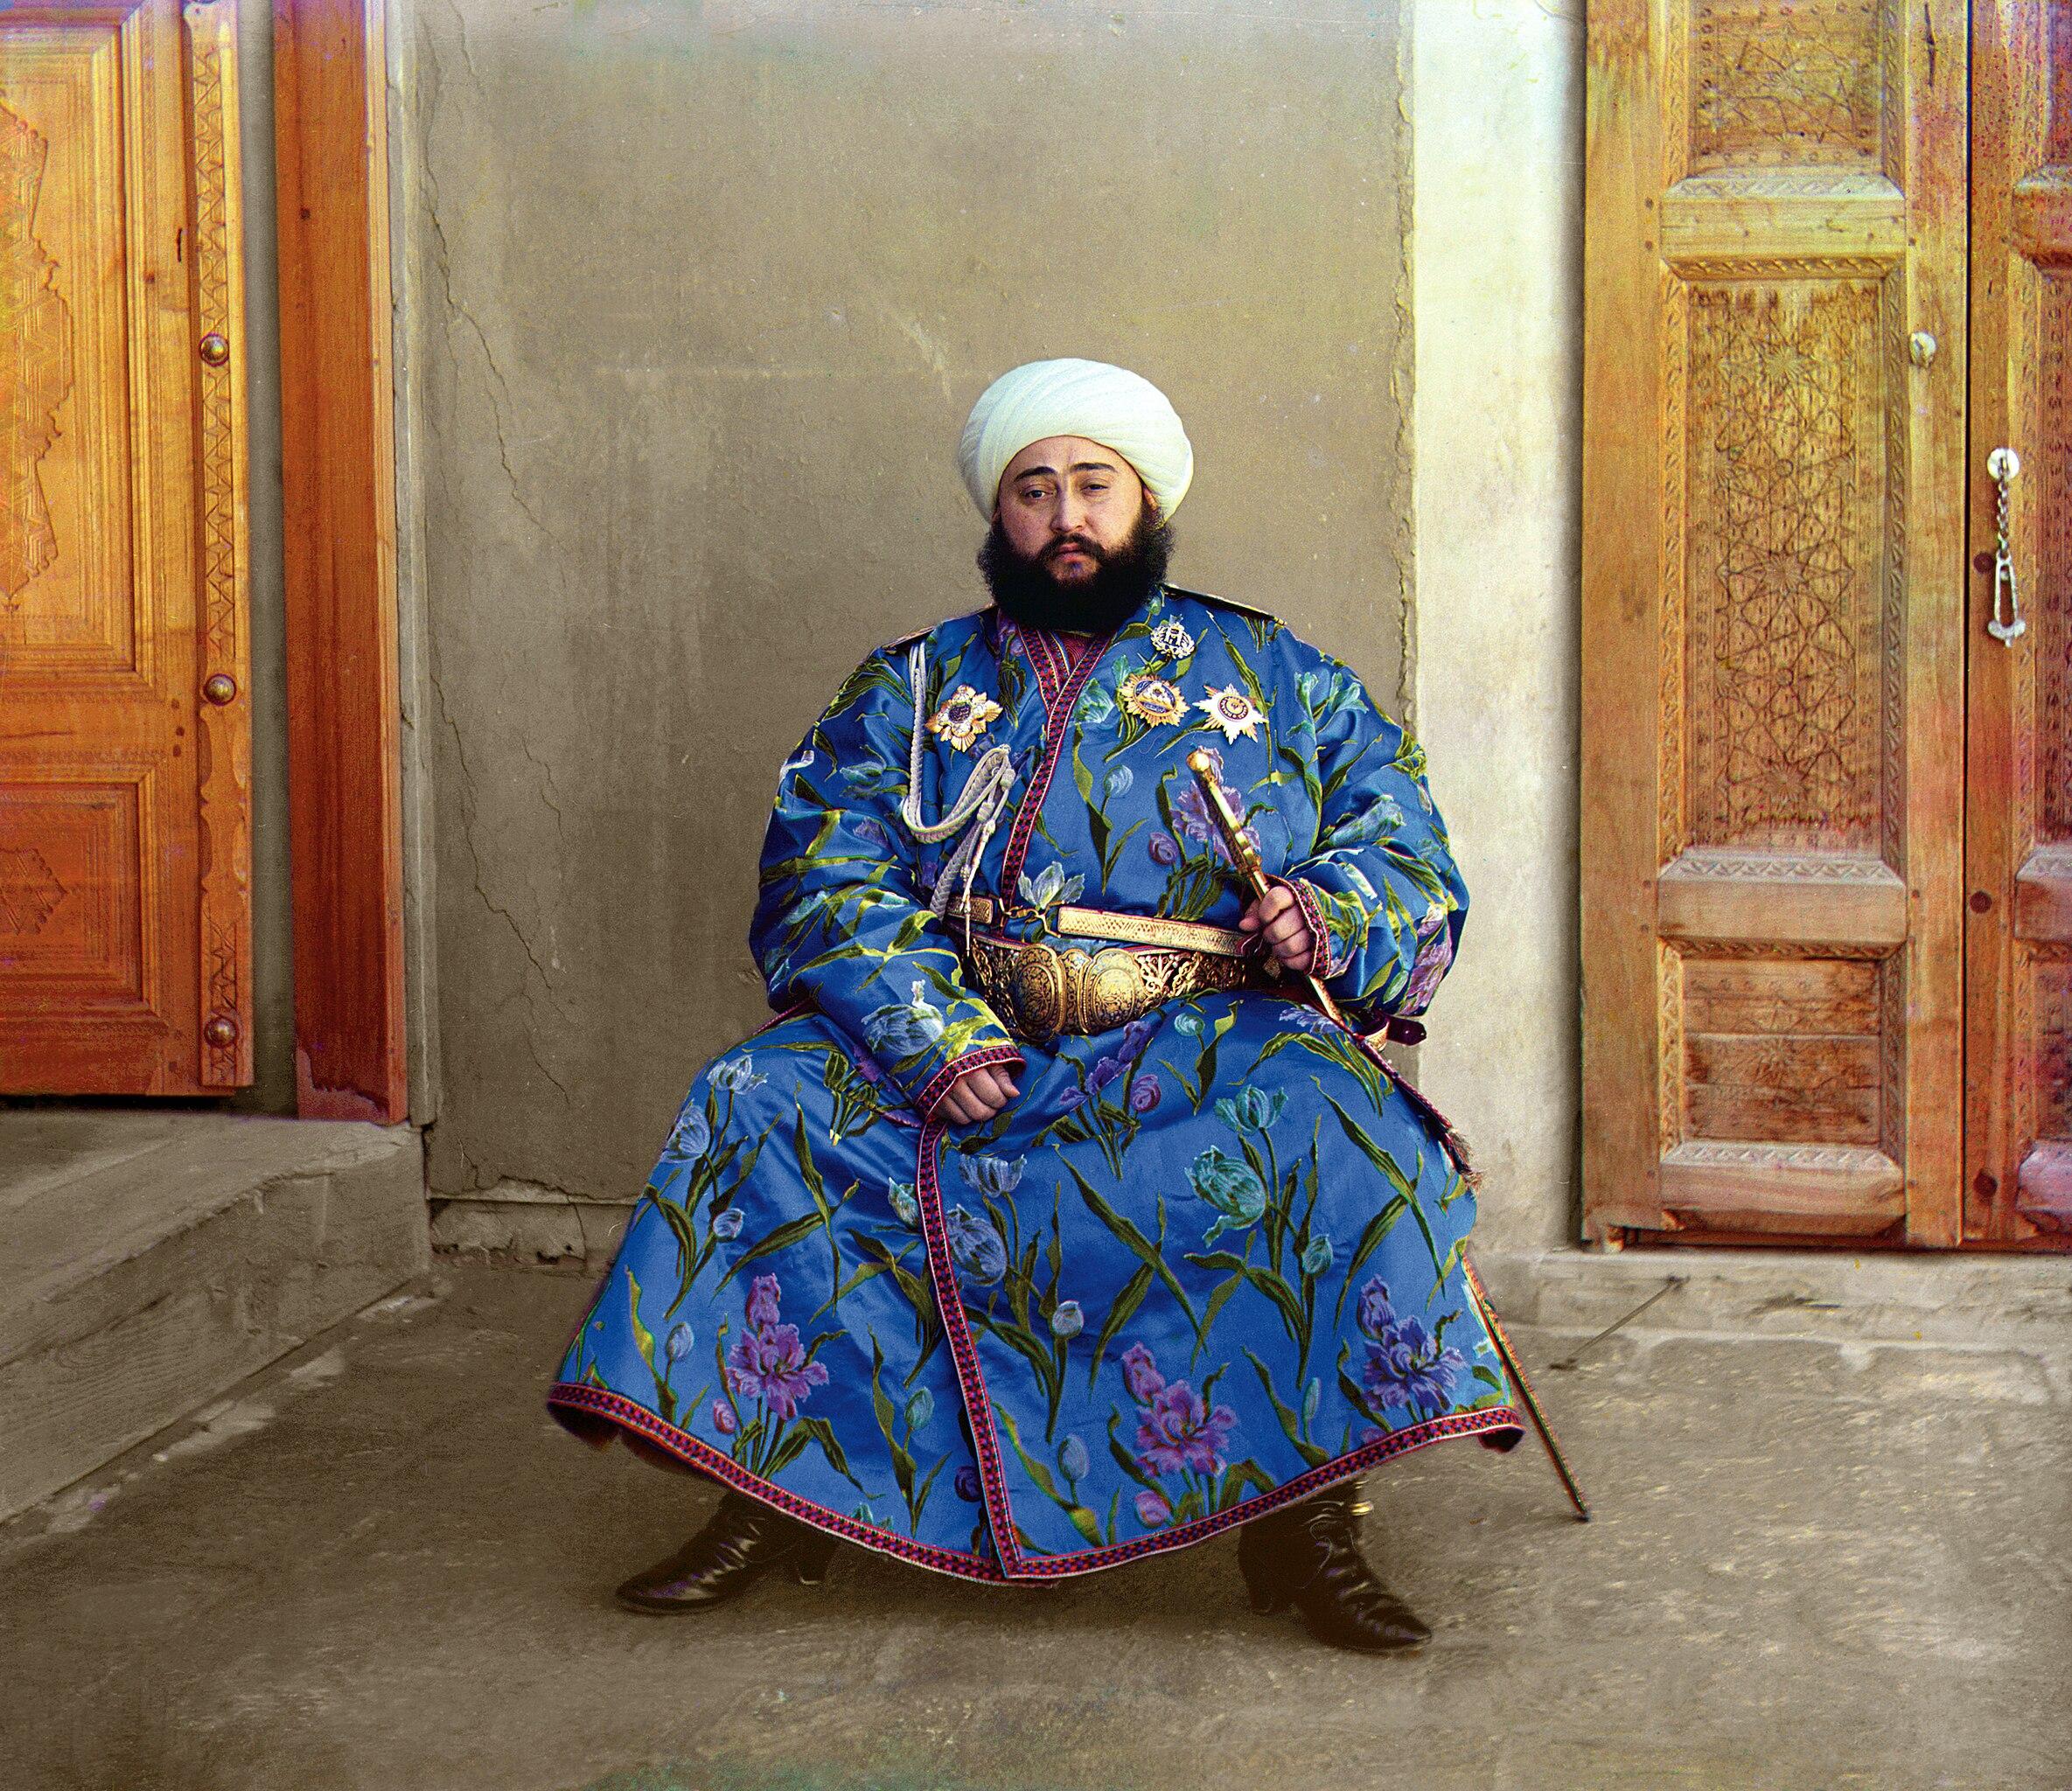 2369px-Alim_Khan_%281880%E2%80%931944%29%2C_Emir_of_Bukhara%2C_photographed_by_S.M._Prokudin-Gorskiy_in_1911.jpg